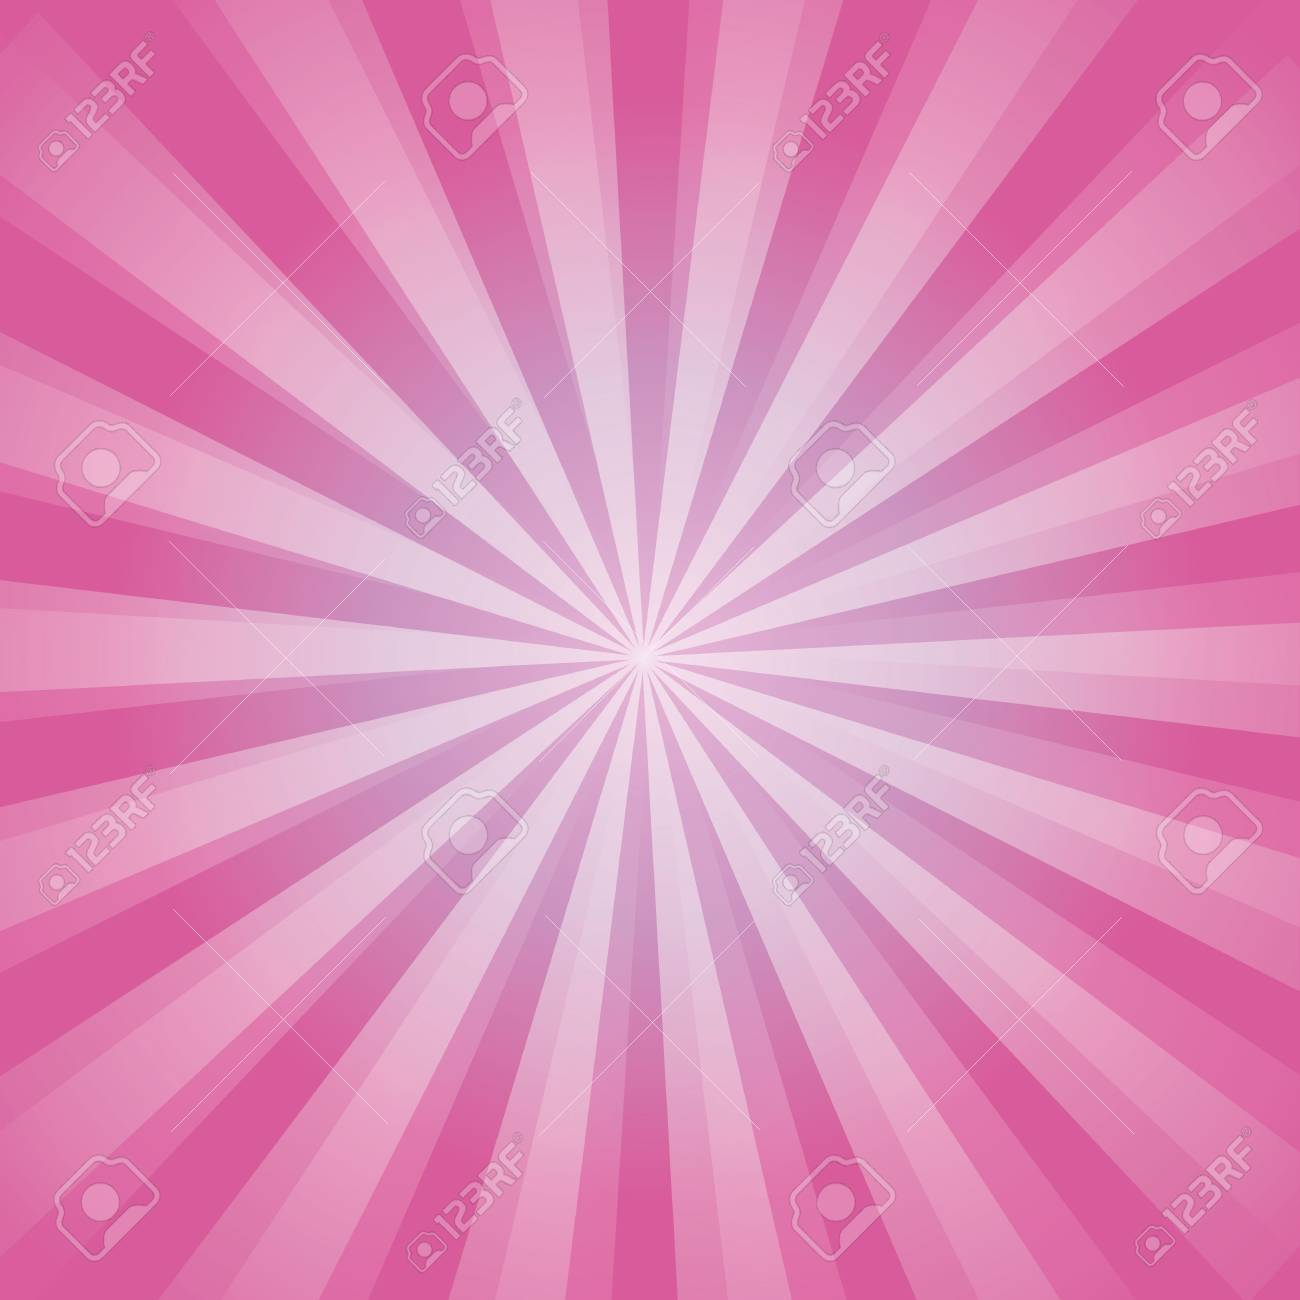 8a0aec0e250 shiny sun ray background. Sun Sunburst Pattern. pink rays summer..